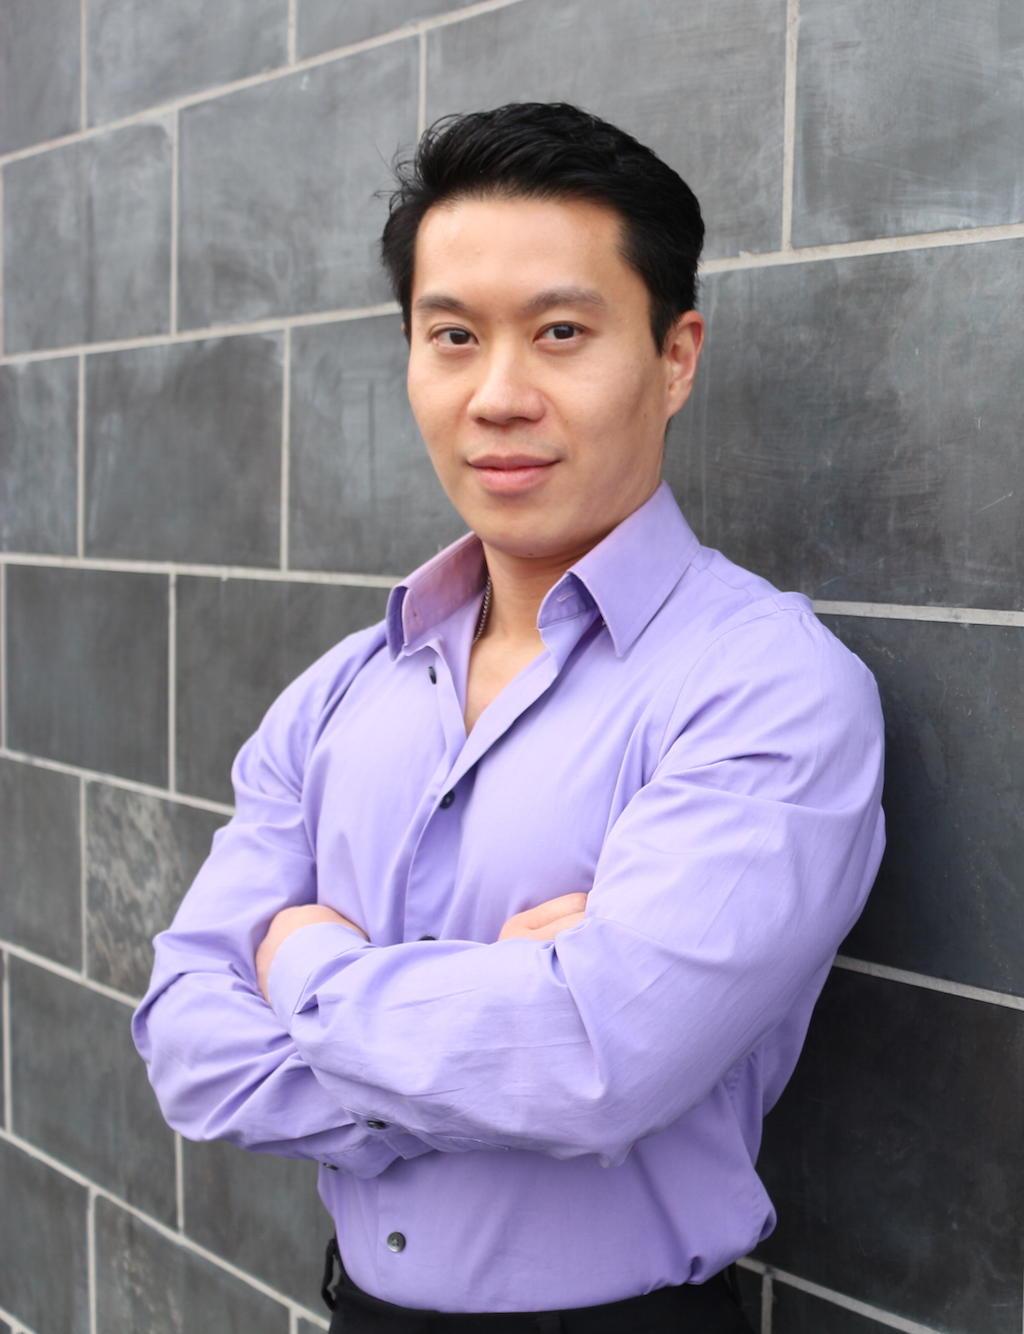 Dr. Roger Tsai, M.D. Plastic Surgery image 1